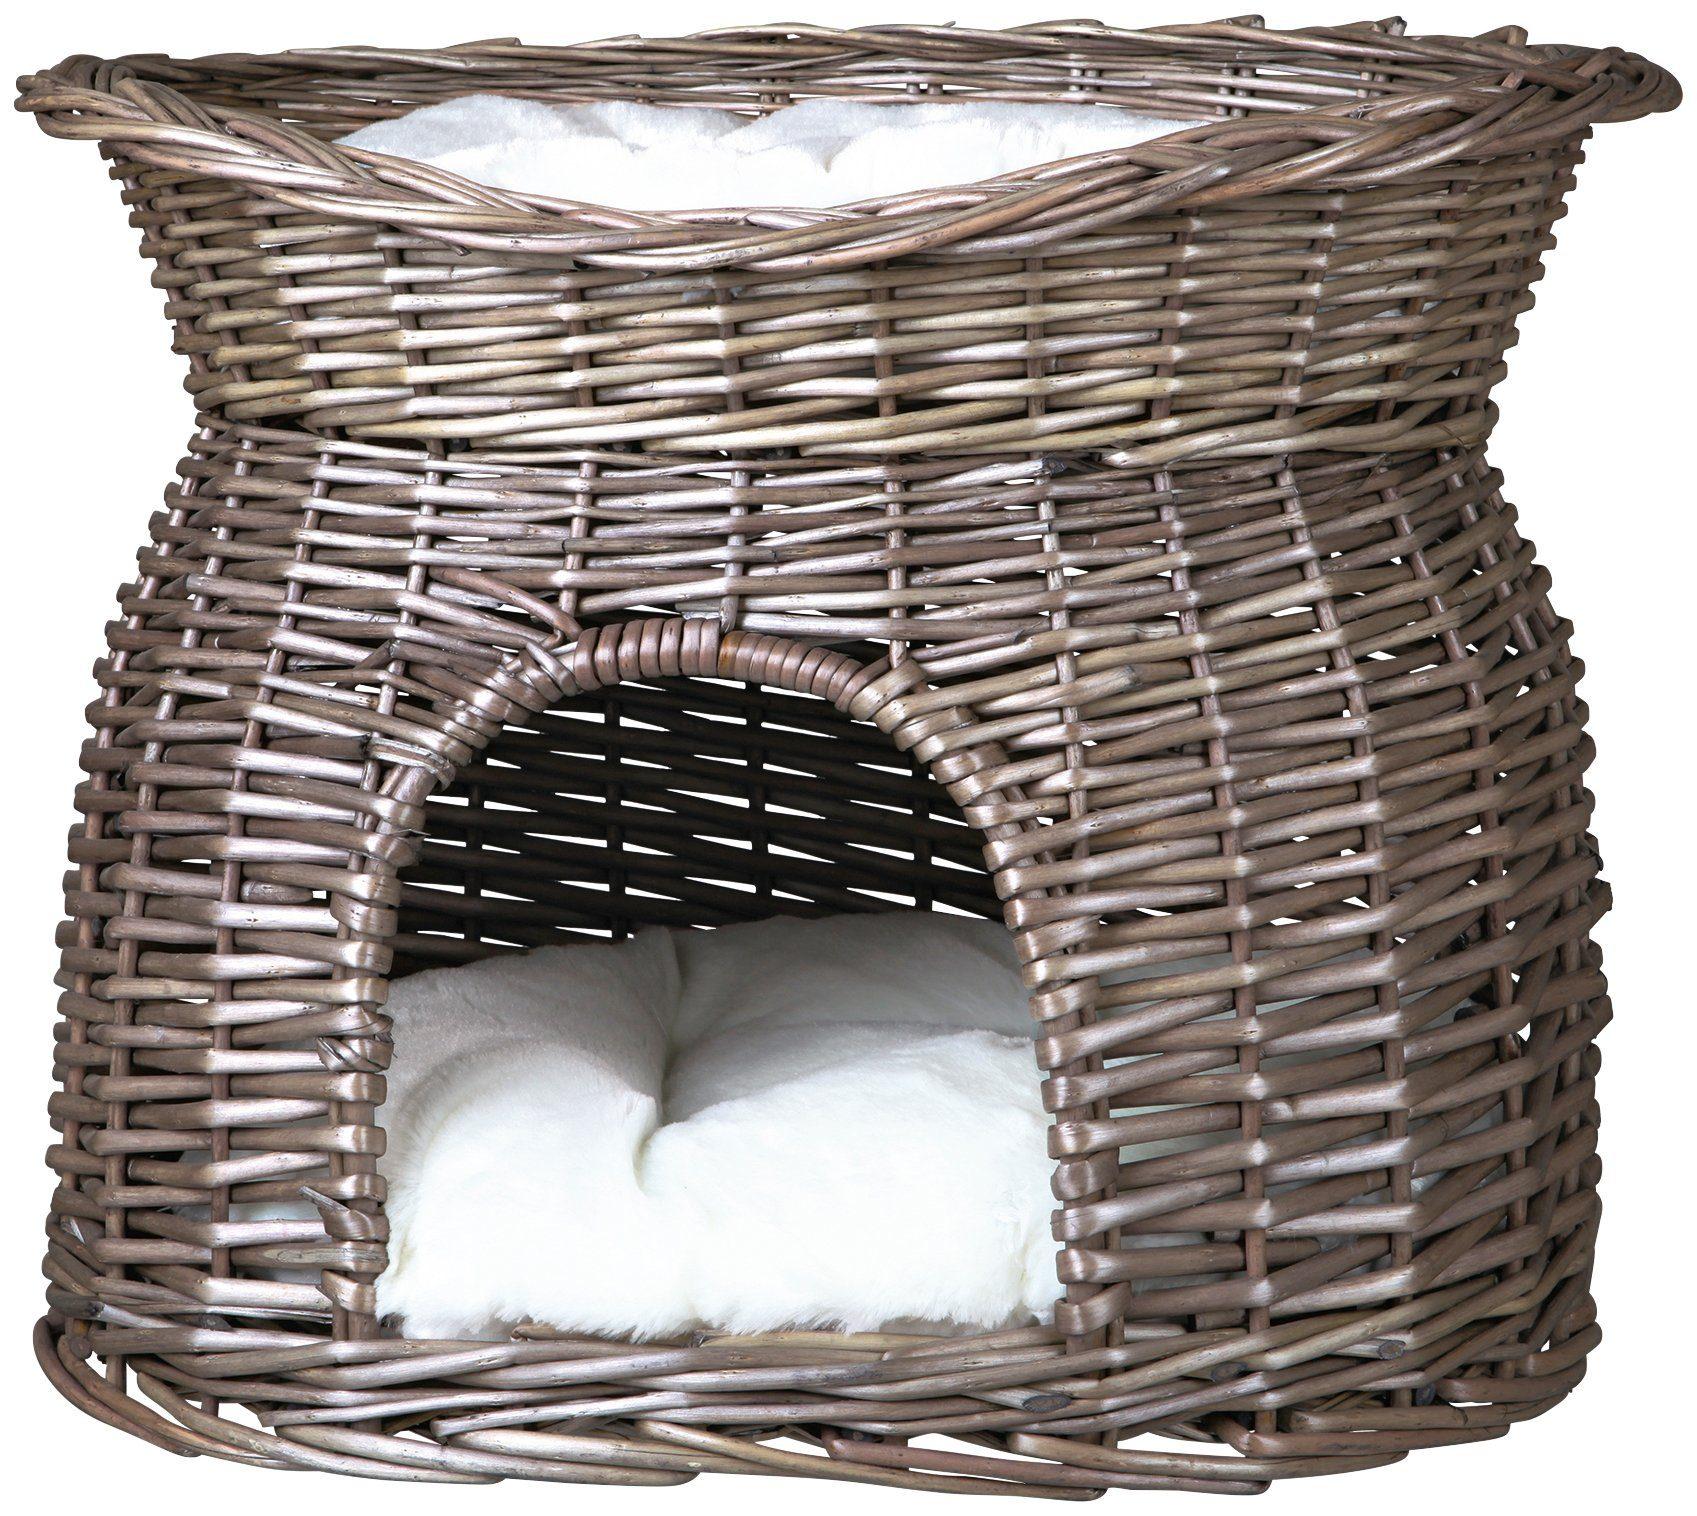 Katzen-Korbturm »Weidenkorb mit Kissen«